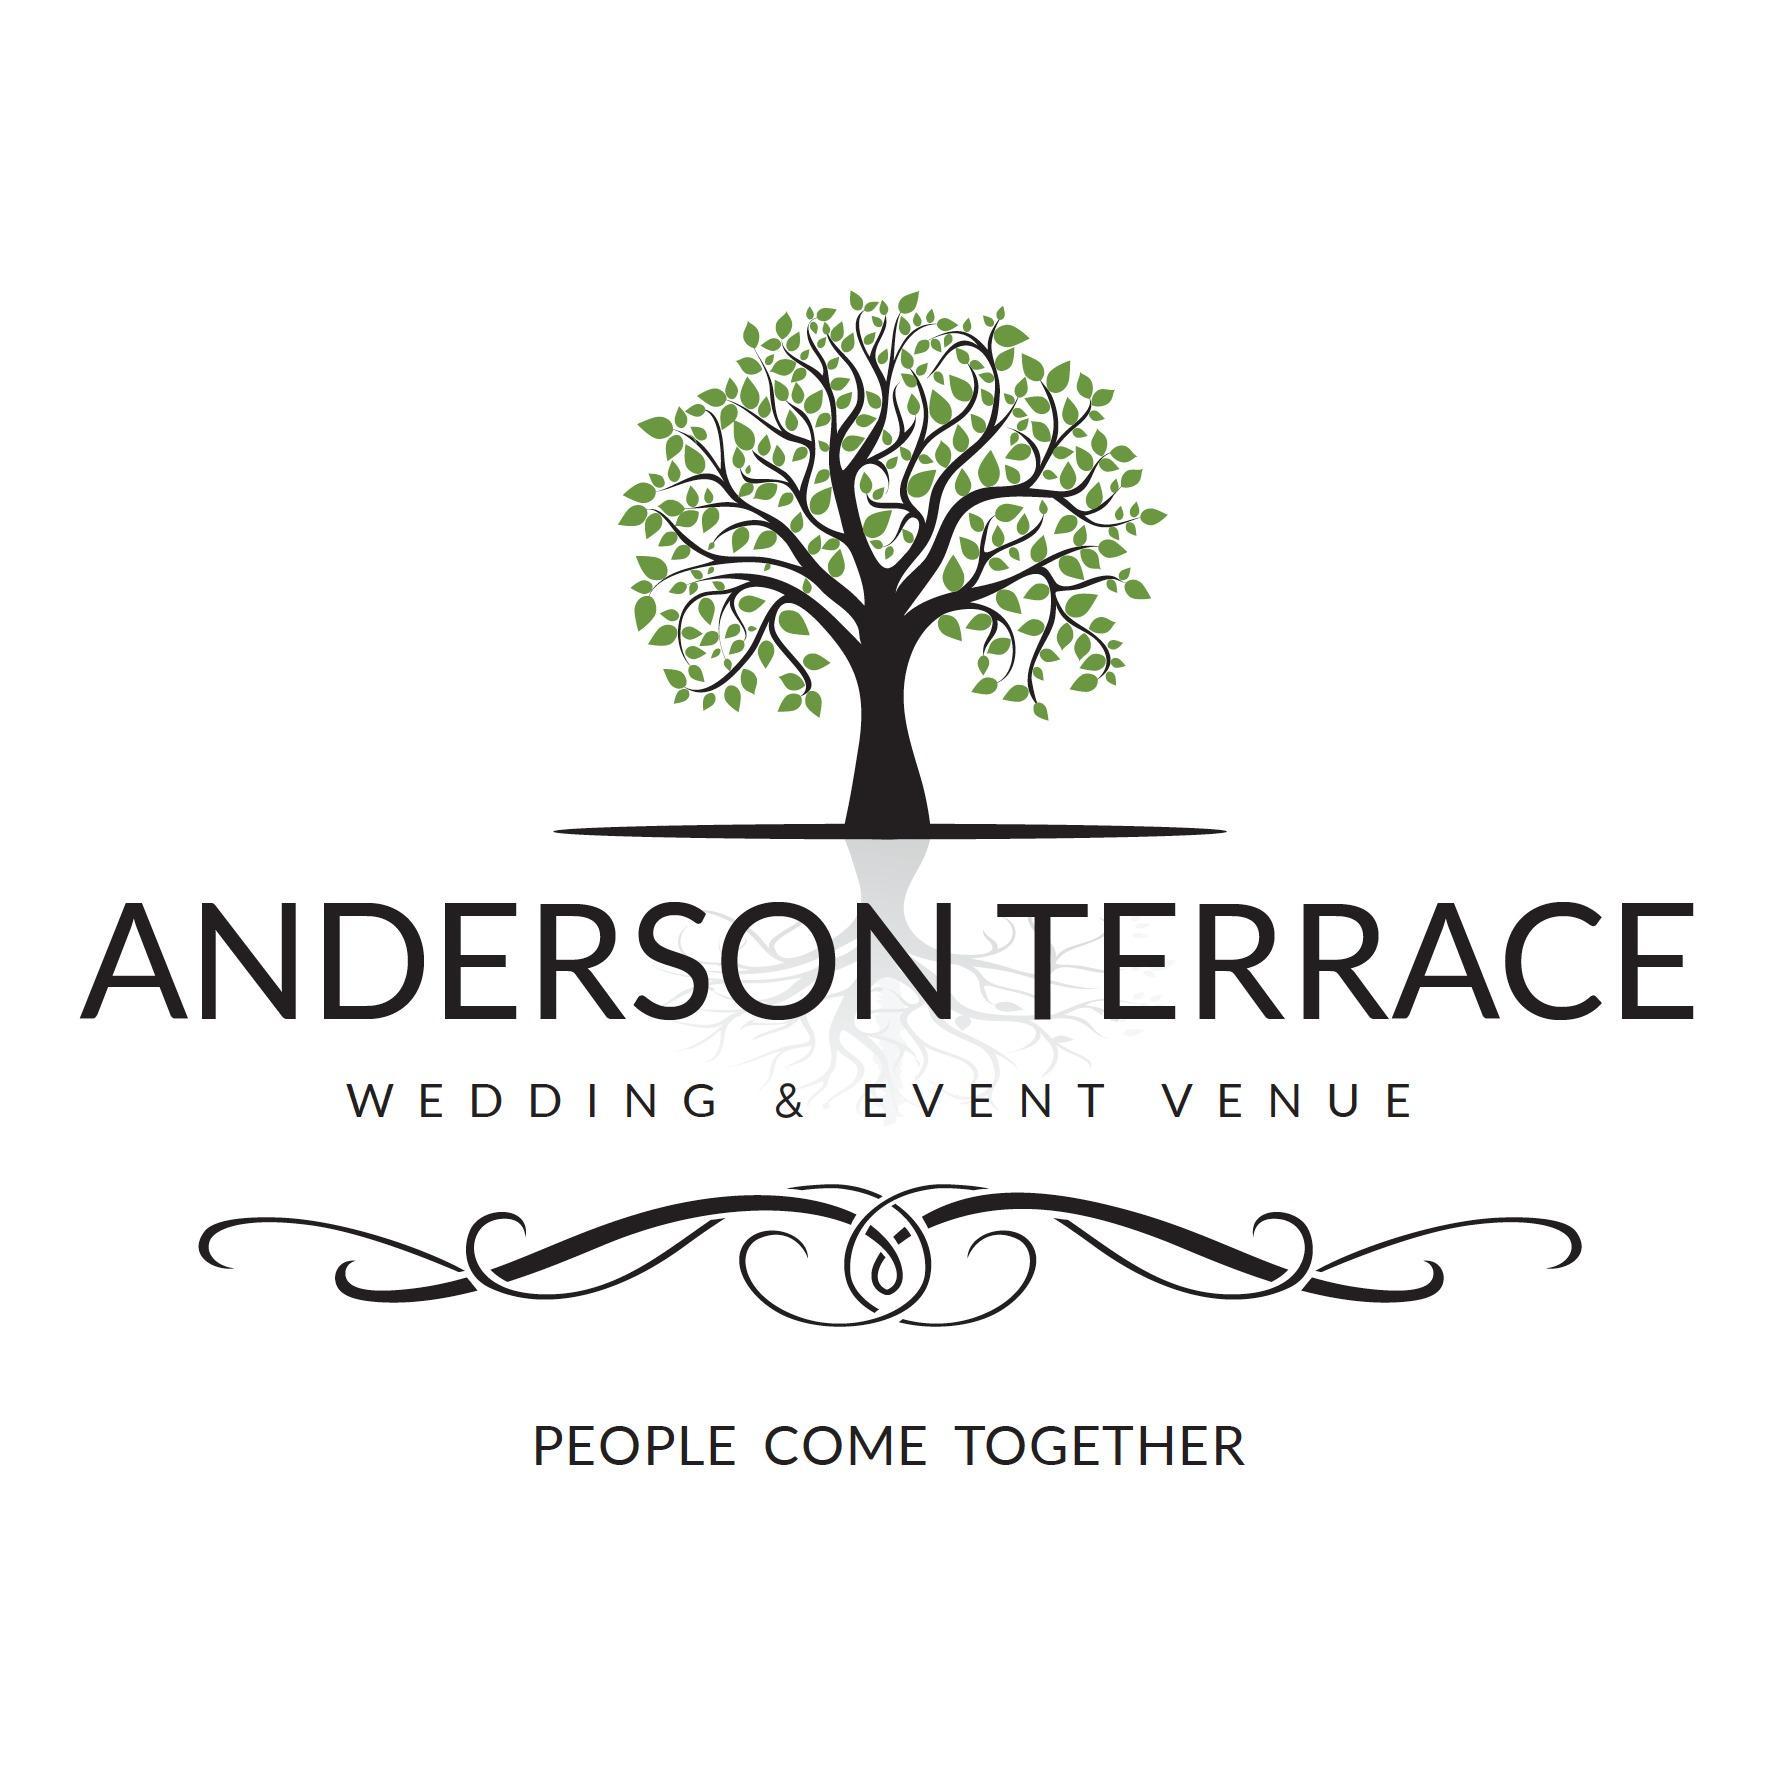 Anderson Terrace Wedding & Event Venue image 3